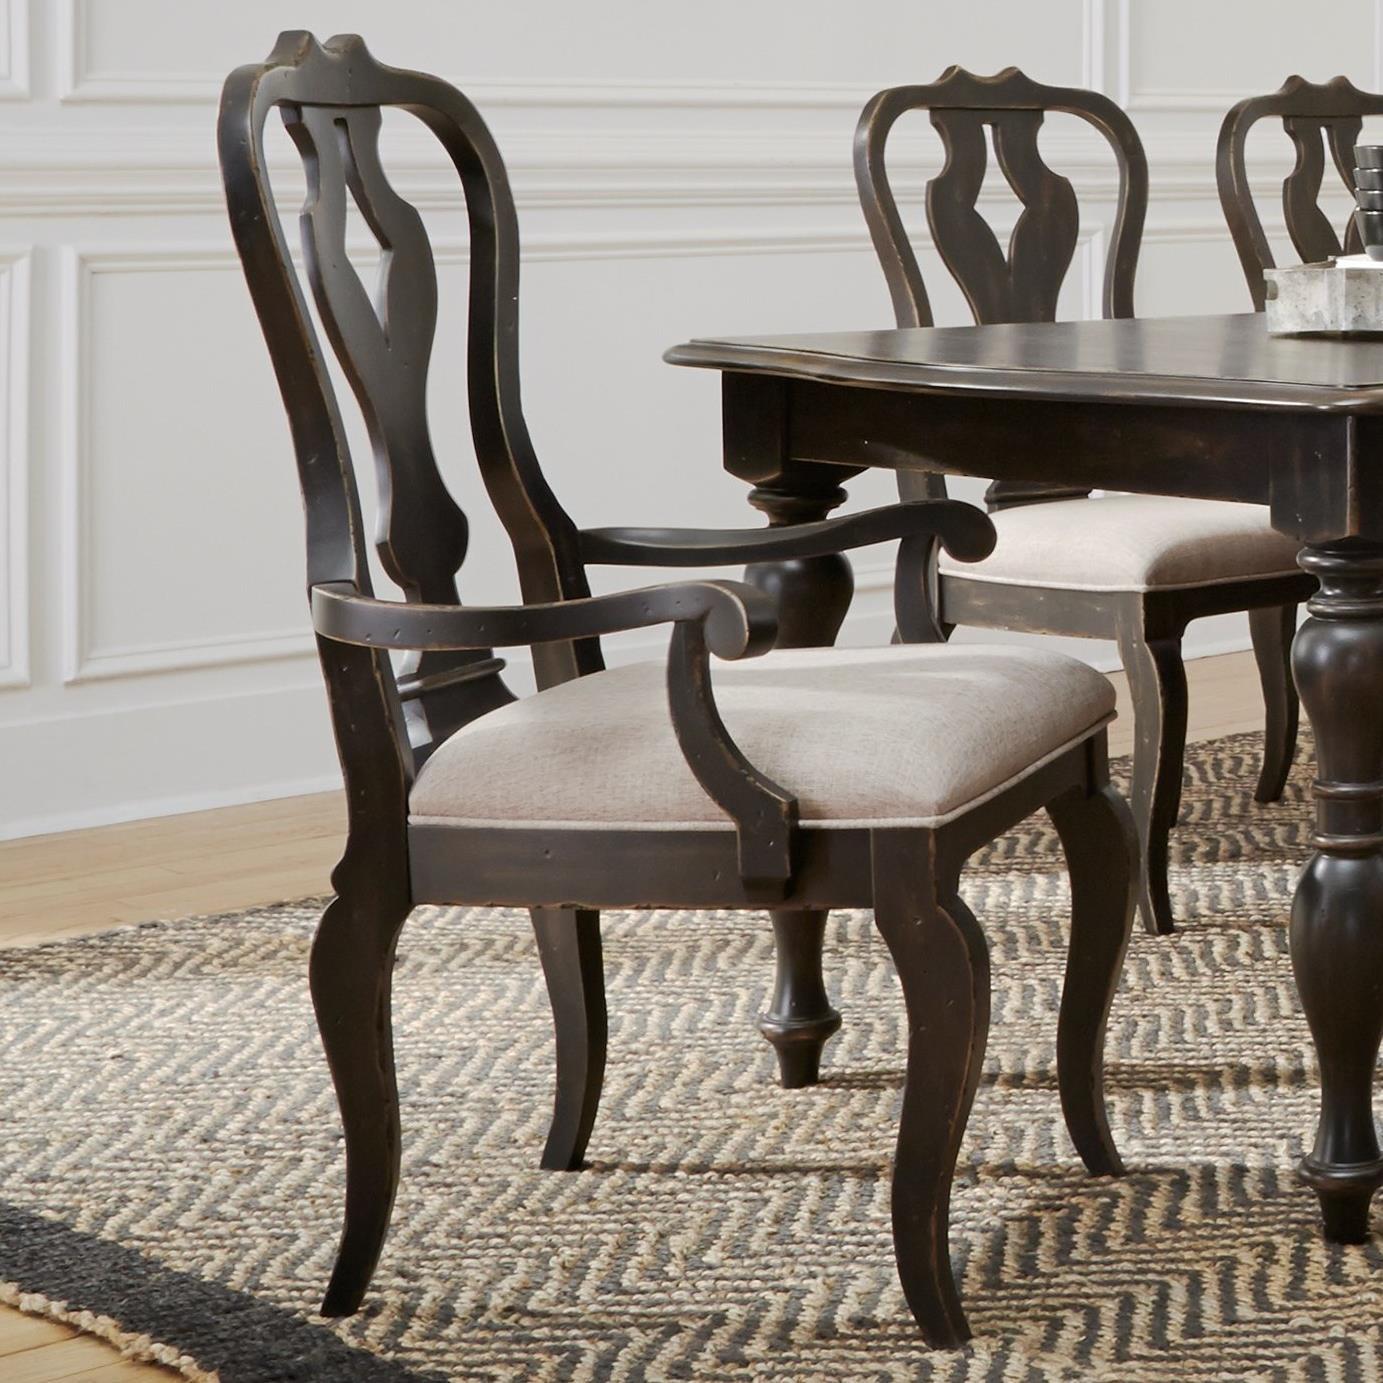 Chesapeake Splat Back Arm Chair by Liberty Furniture at Standard Furniture